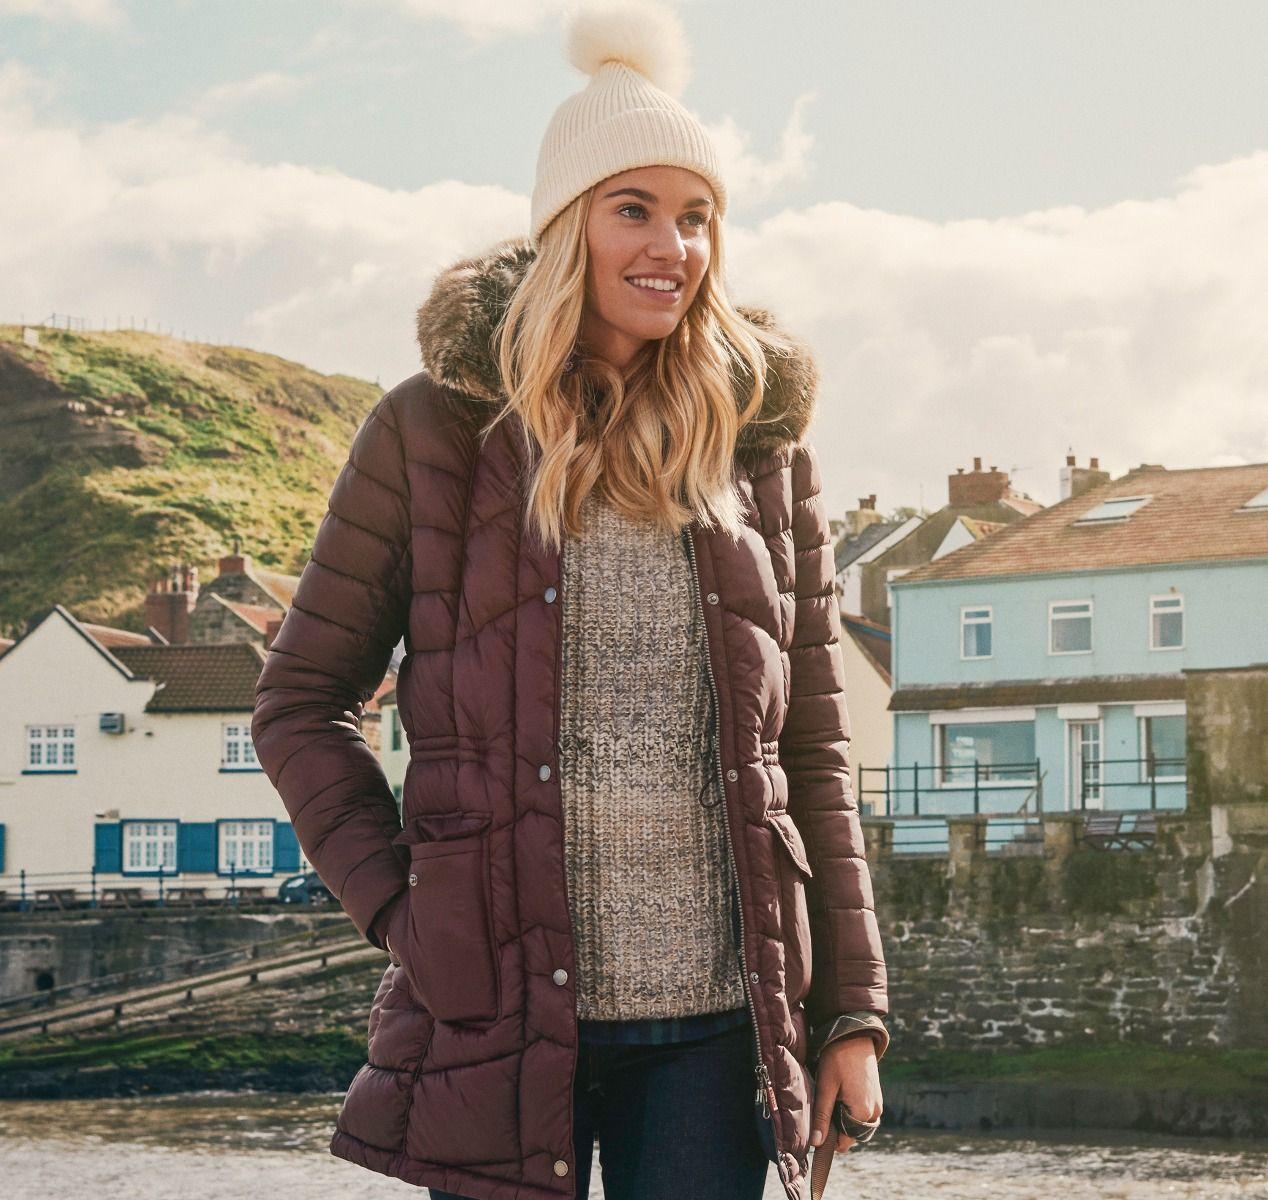 501de14d57c Τα μπουφάν του brand Barbour βρίσκονται στη wishlist κάθε γνήσιας  fashionista που ξέρει από στυλ. Τα φορούν τα αγαπημένα μας icons όπως η  Sienna Miller και ...